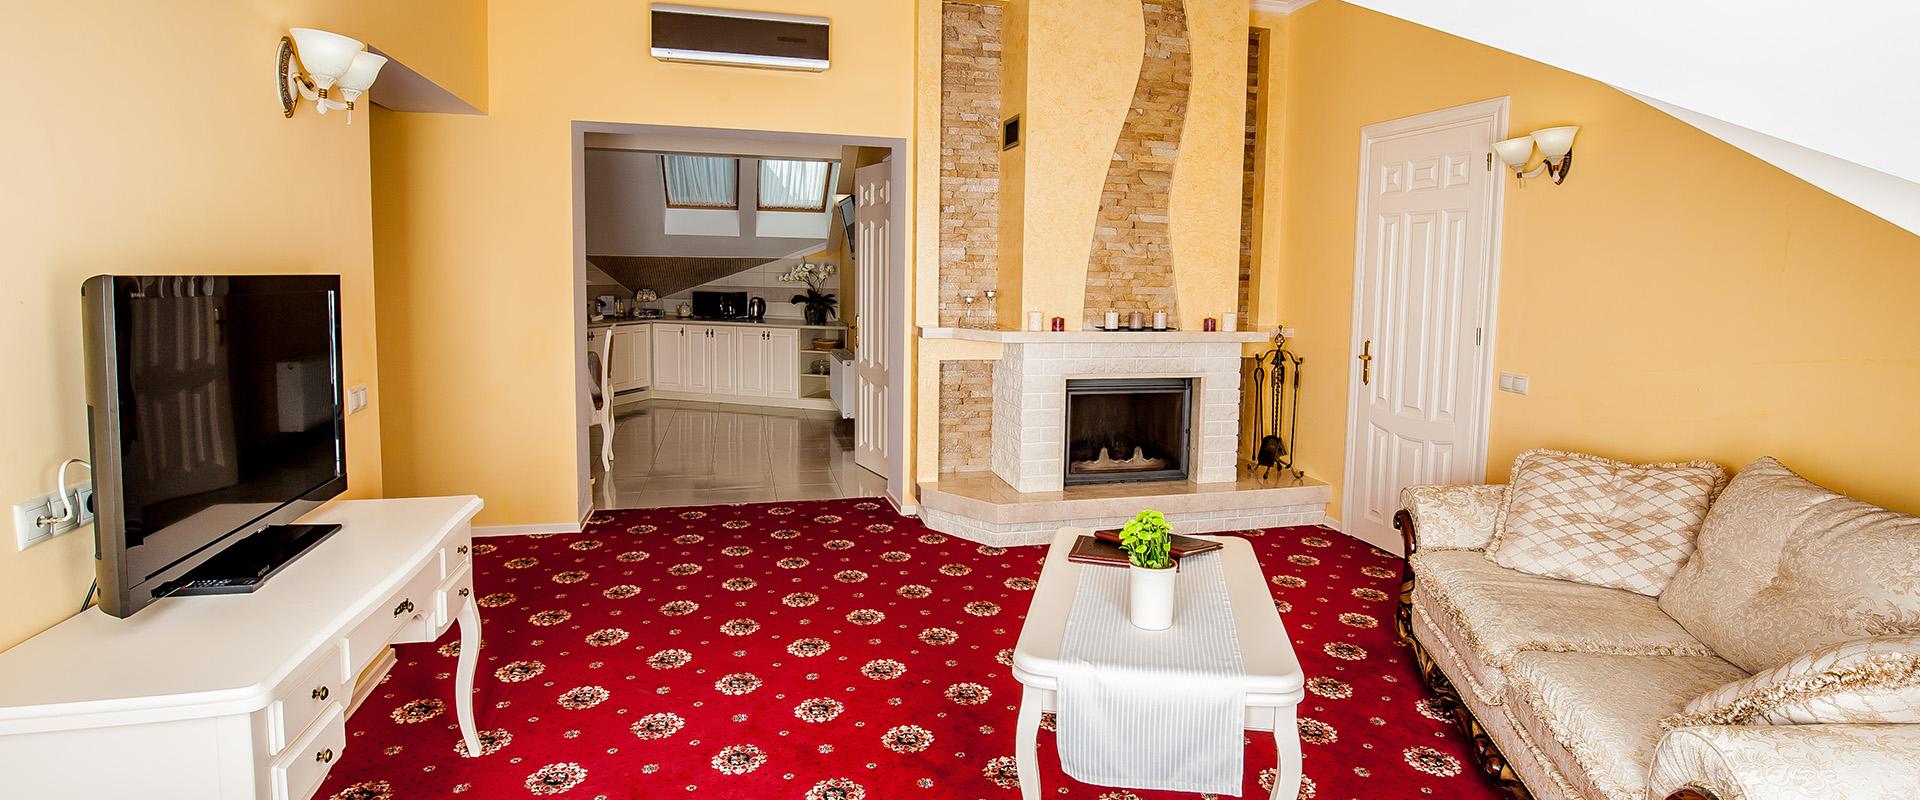 Апартаменти з каміном спа-готель Respect